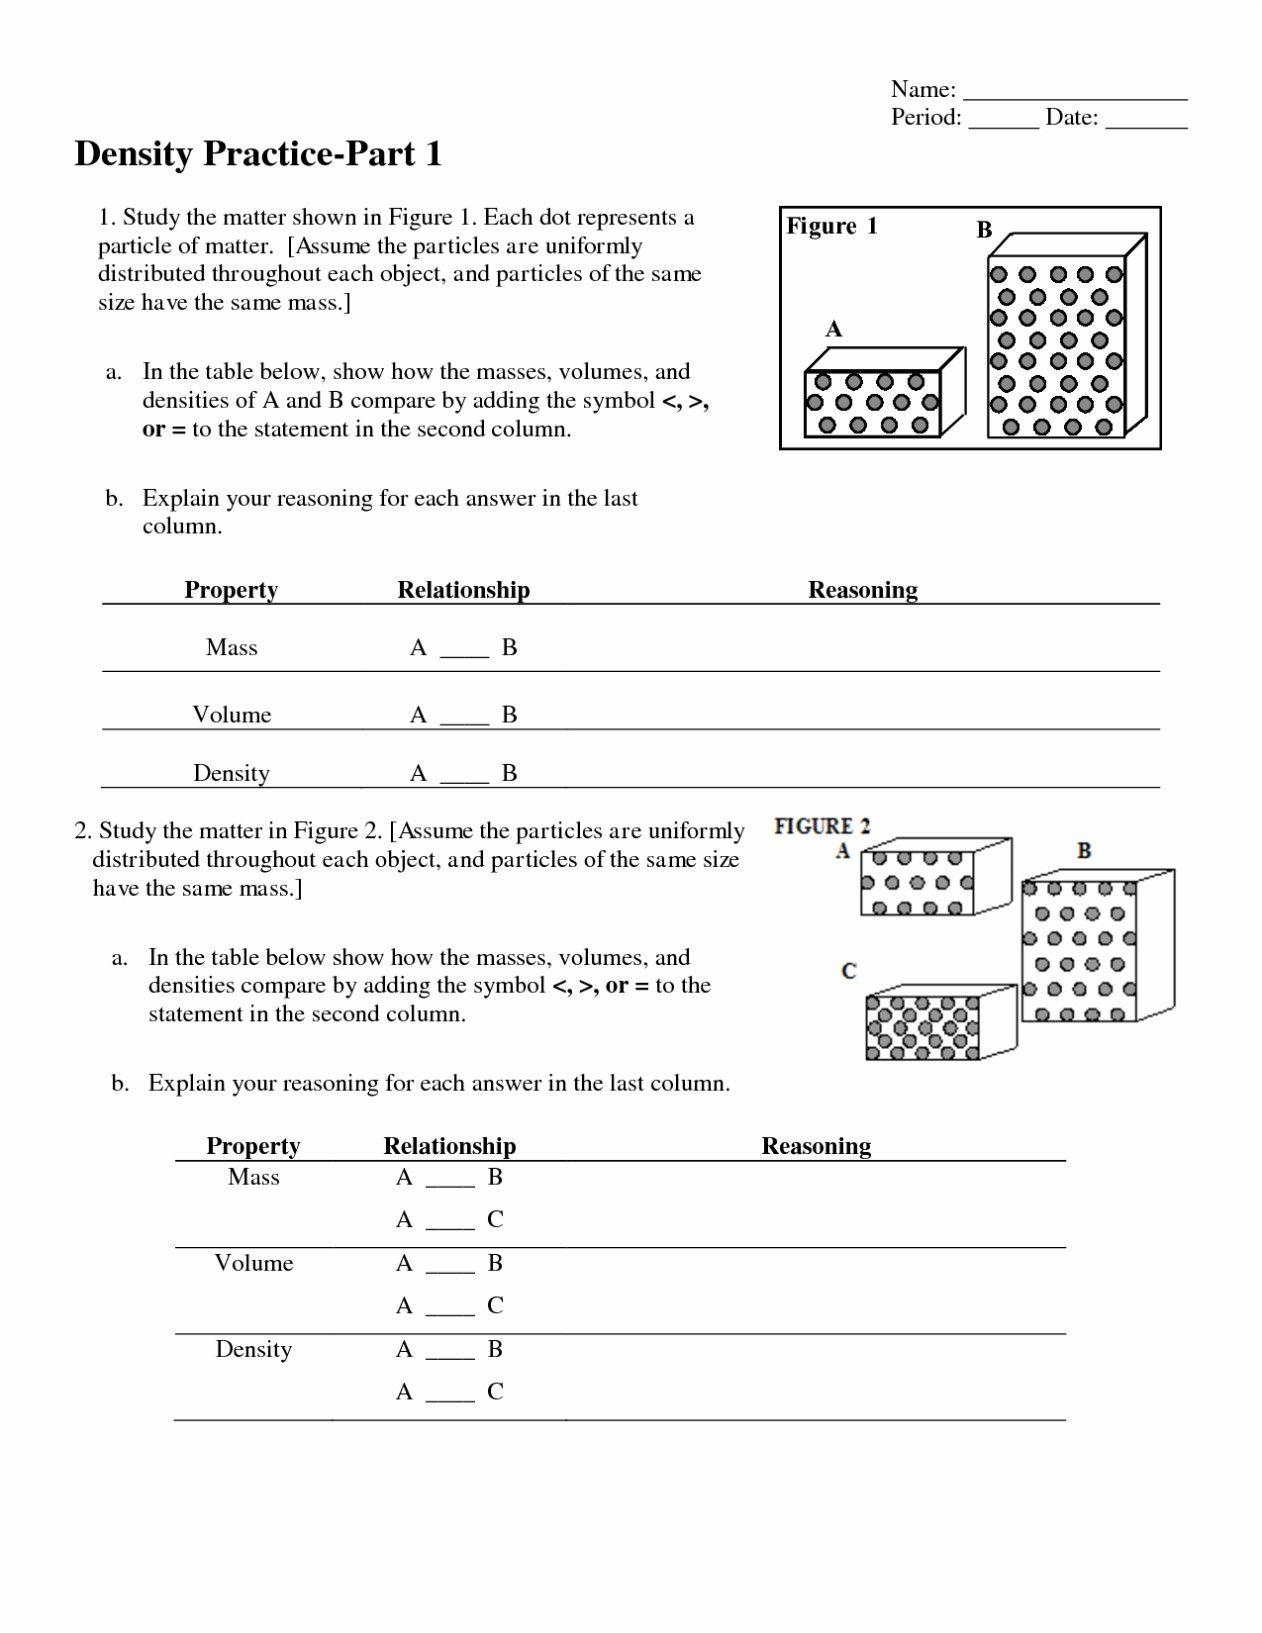 Chemistry Unit 1 Worksheet 3 Mass Volume And Density